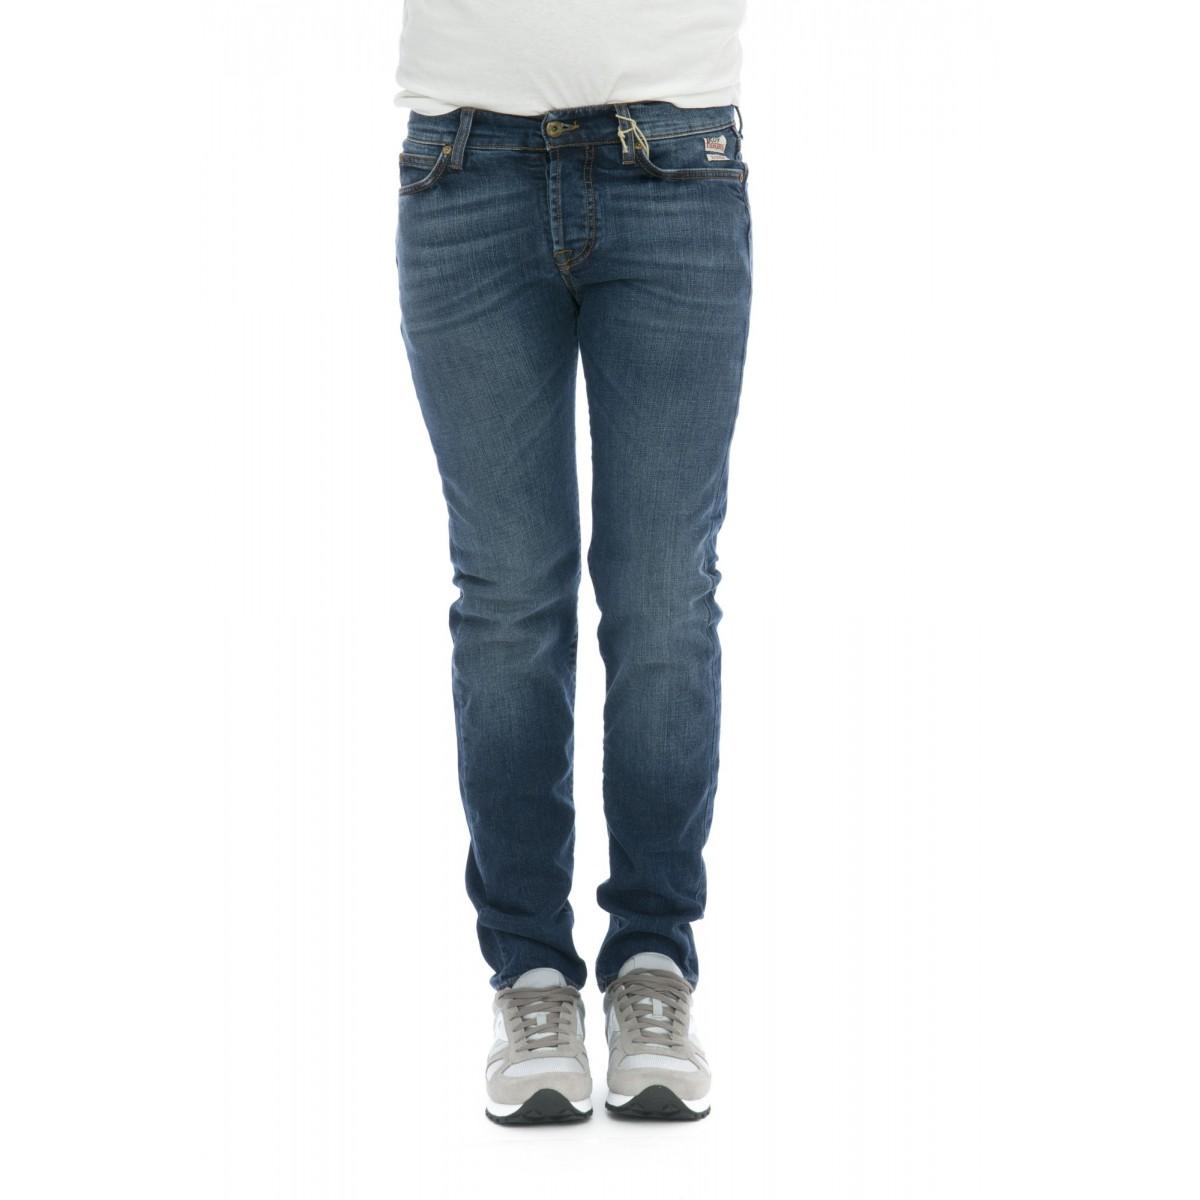 Jeans - Pf18 drake superior